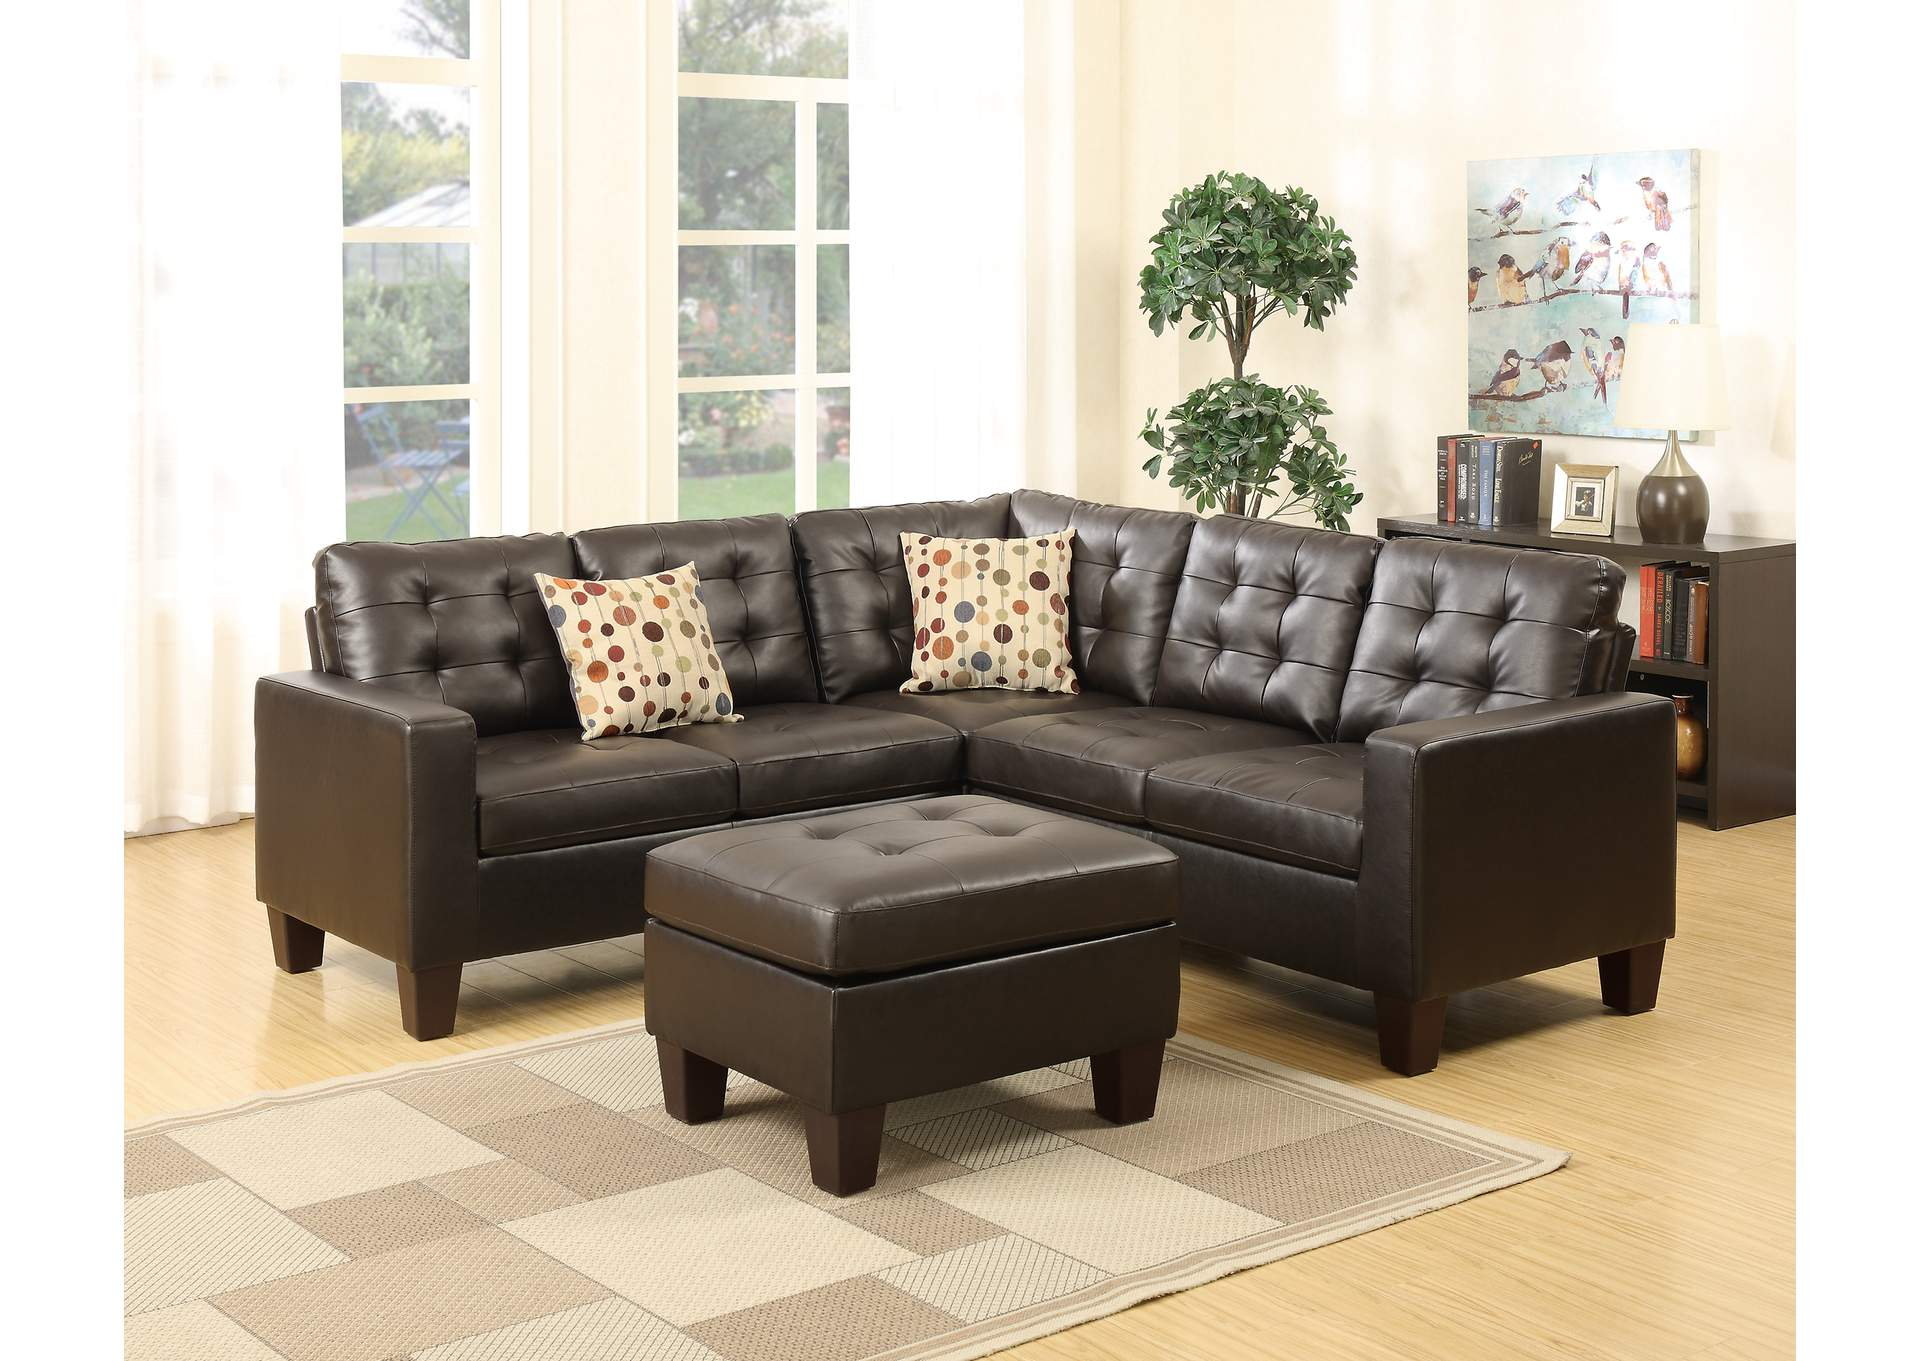 Bayit Furniture Carmine 2 Pc Sectional Sofa